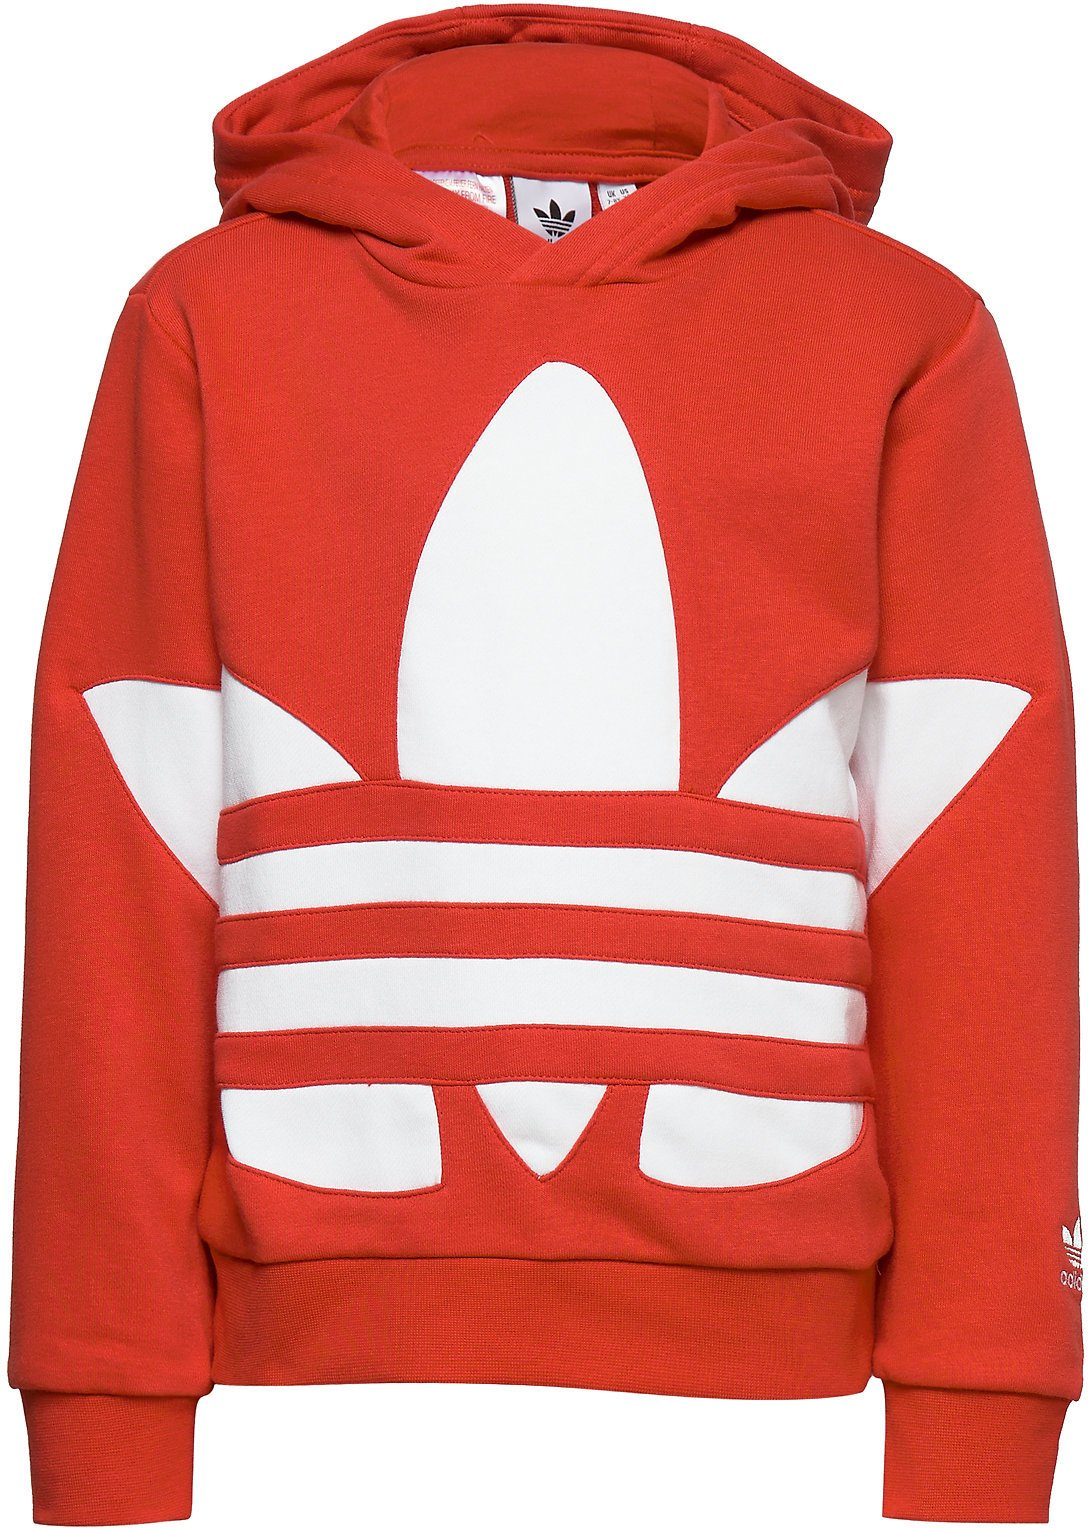 adidas originals trefoil hoodie red, adidas Performance